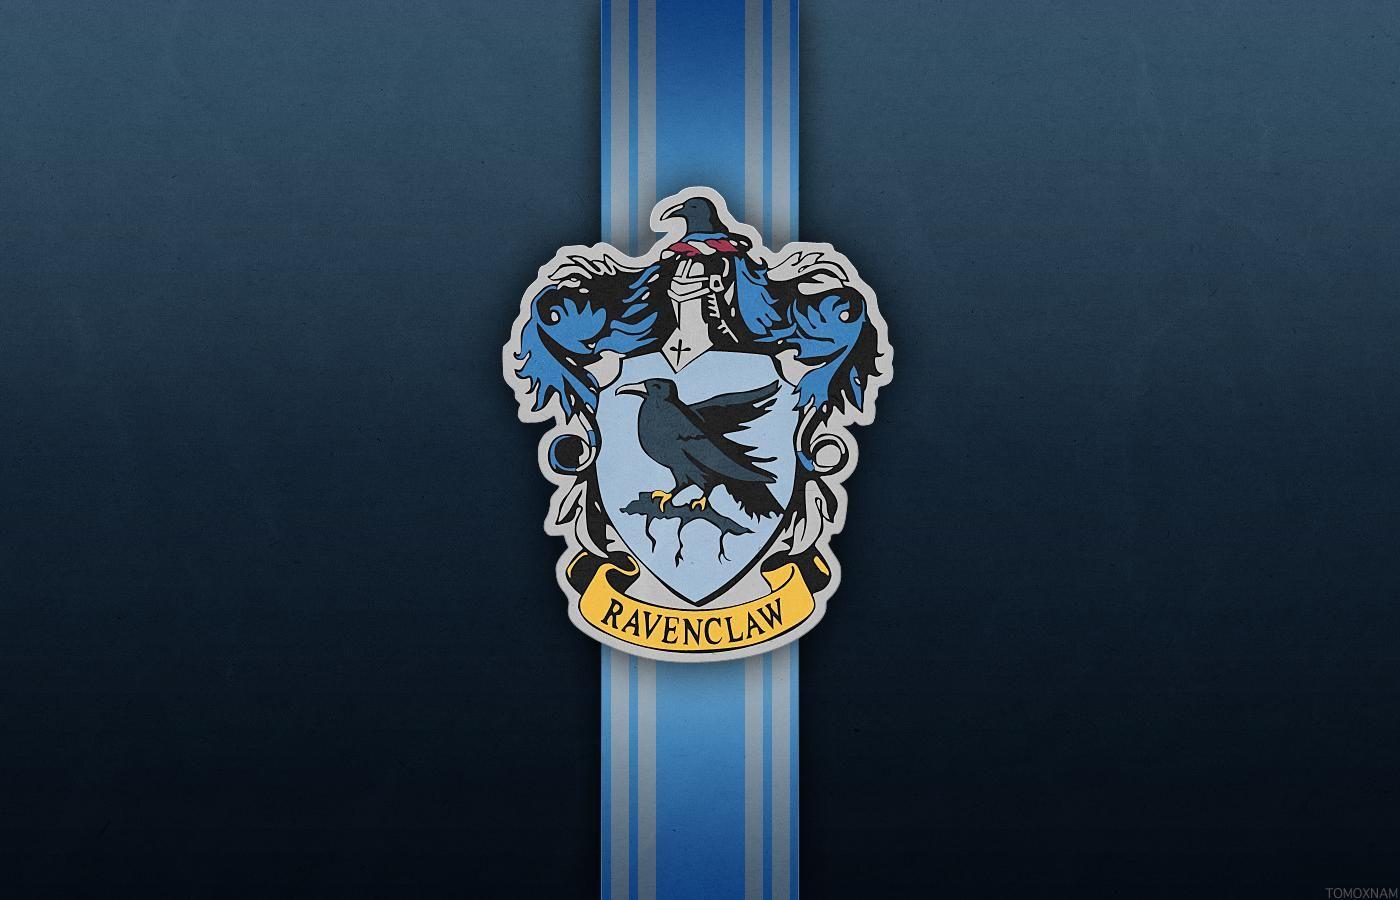 Ravenclaw Wallpaper Hd Wallpapersafari Harry Potter Ravenclaw Harry Potter Quiz Ravenclaw